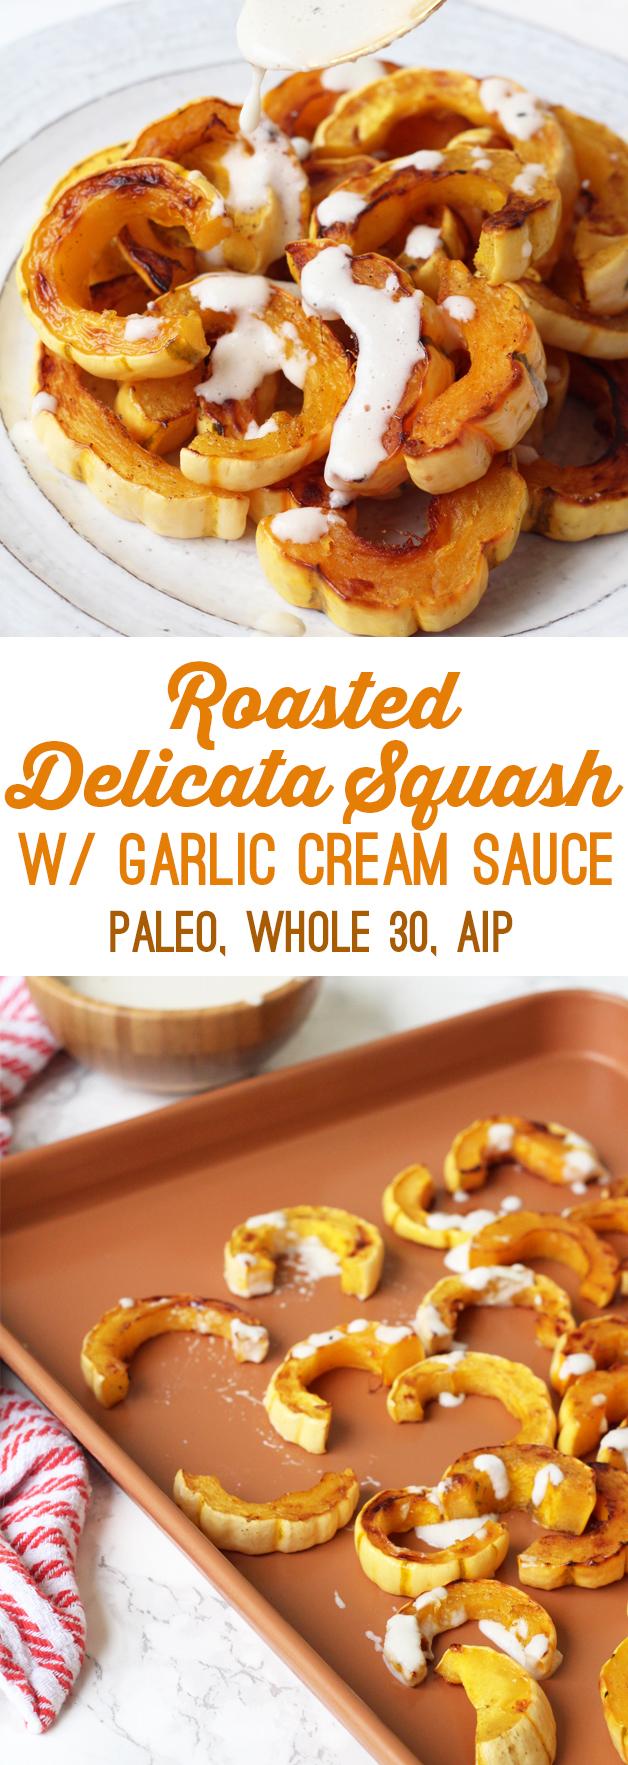 Roasted Delicata Squash w/ Garlic Cream Sauce (Paleo, AIP, Whole30)